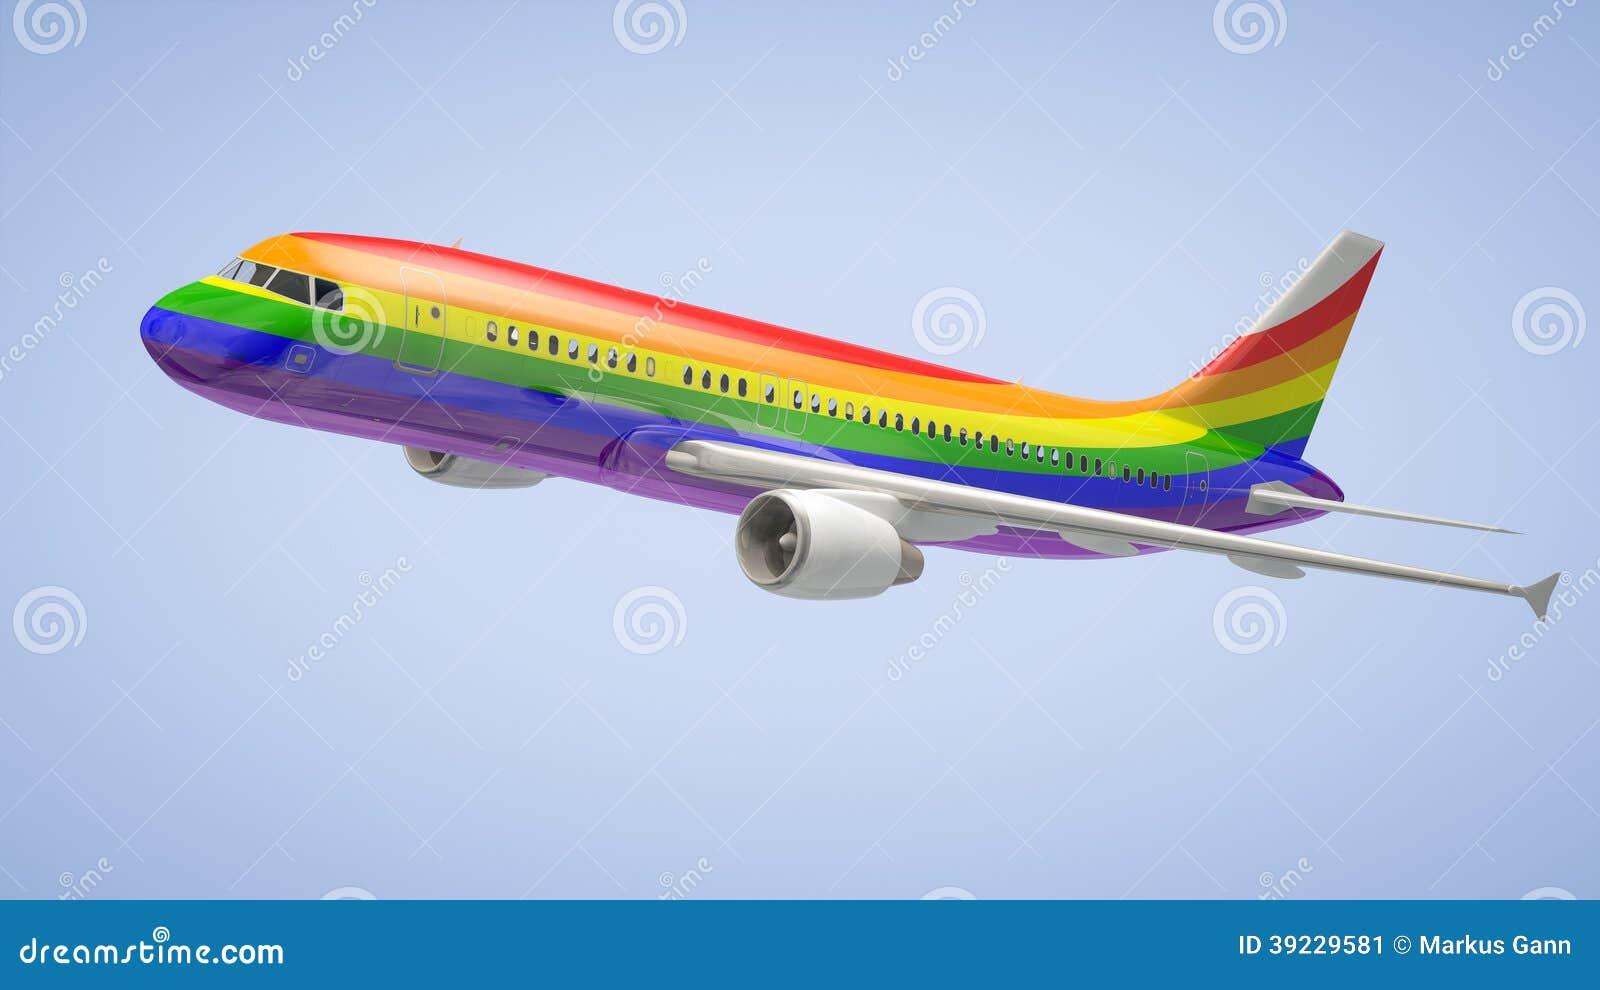 Plane Graphic Design